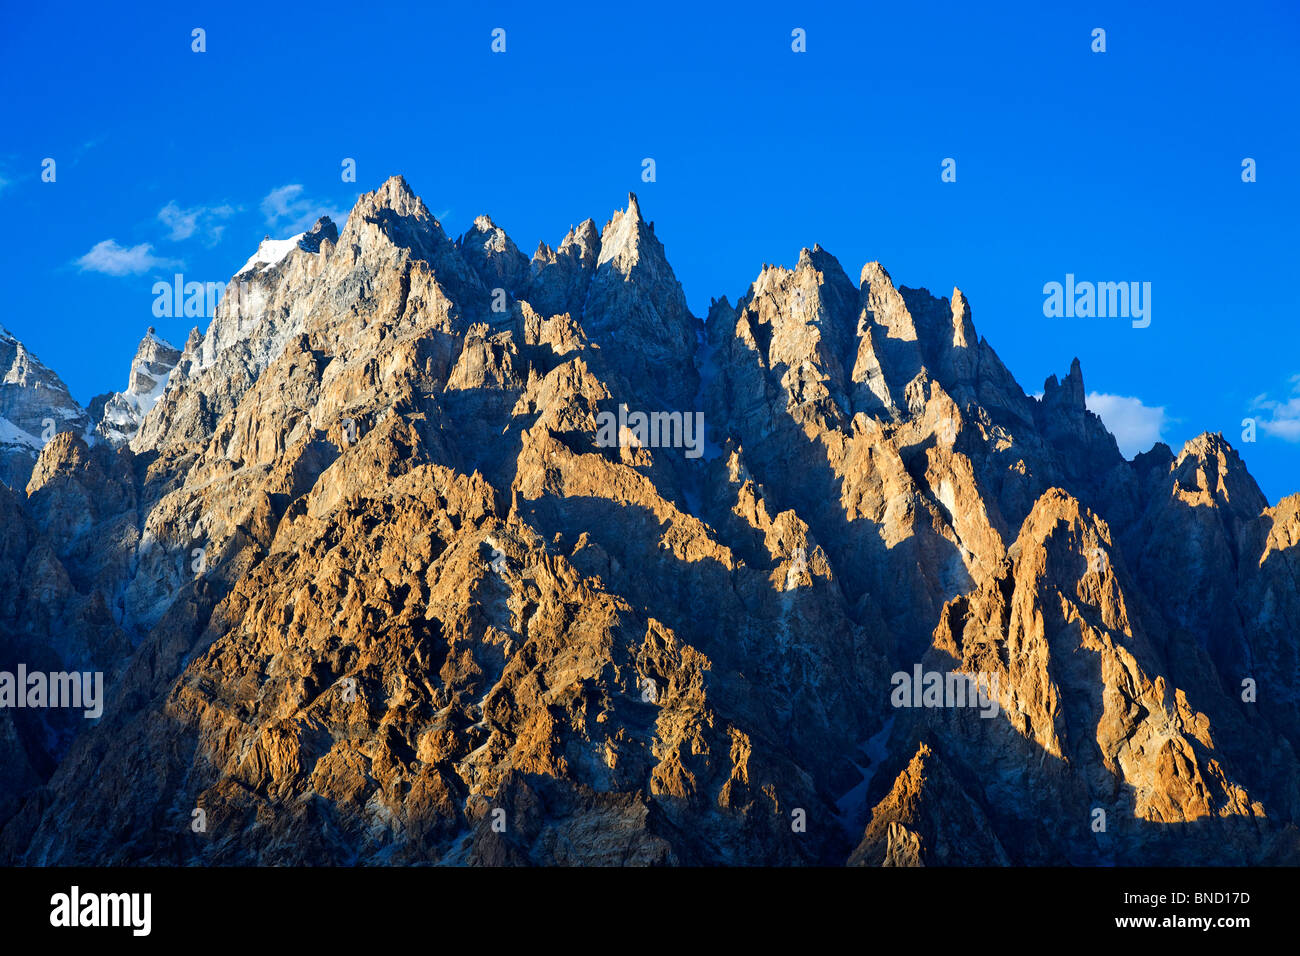 Cathedral spires mountain peaks, Passu, Hunza Valley, Karakorum, Pakistan - Stock Image